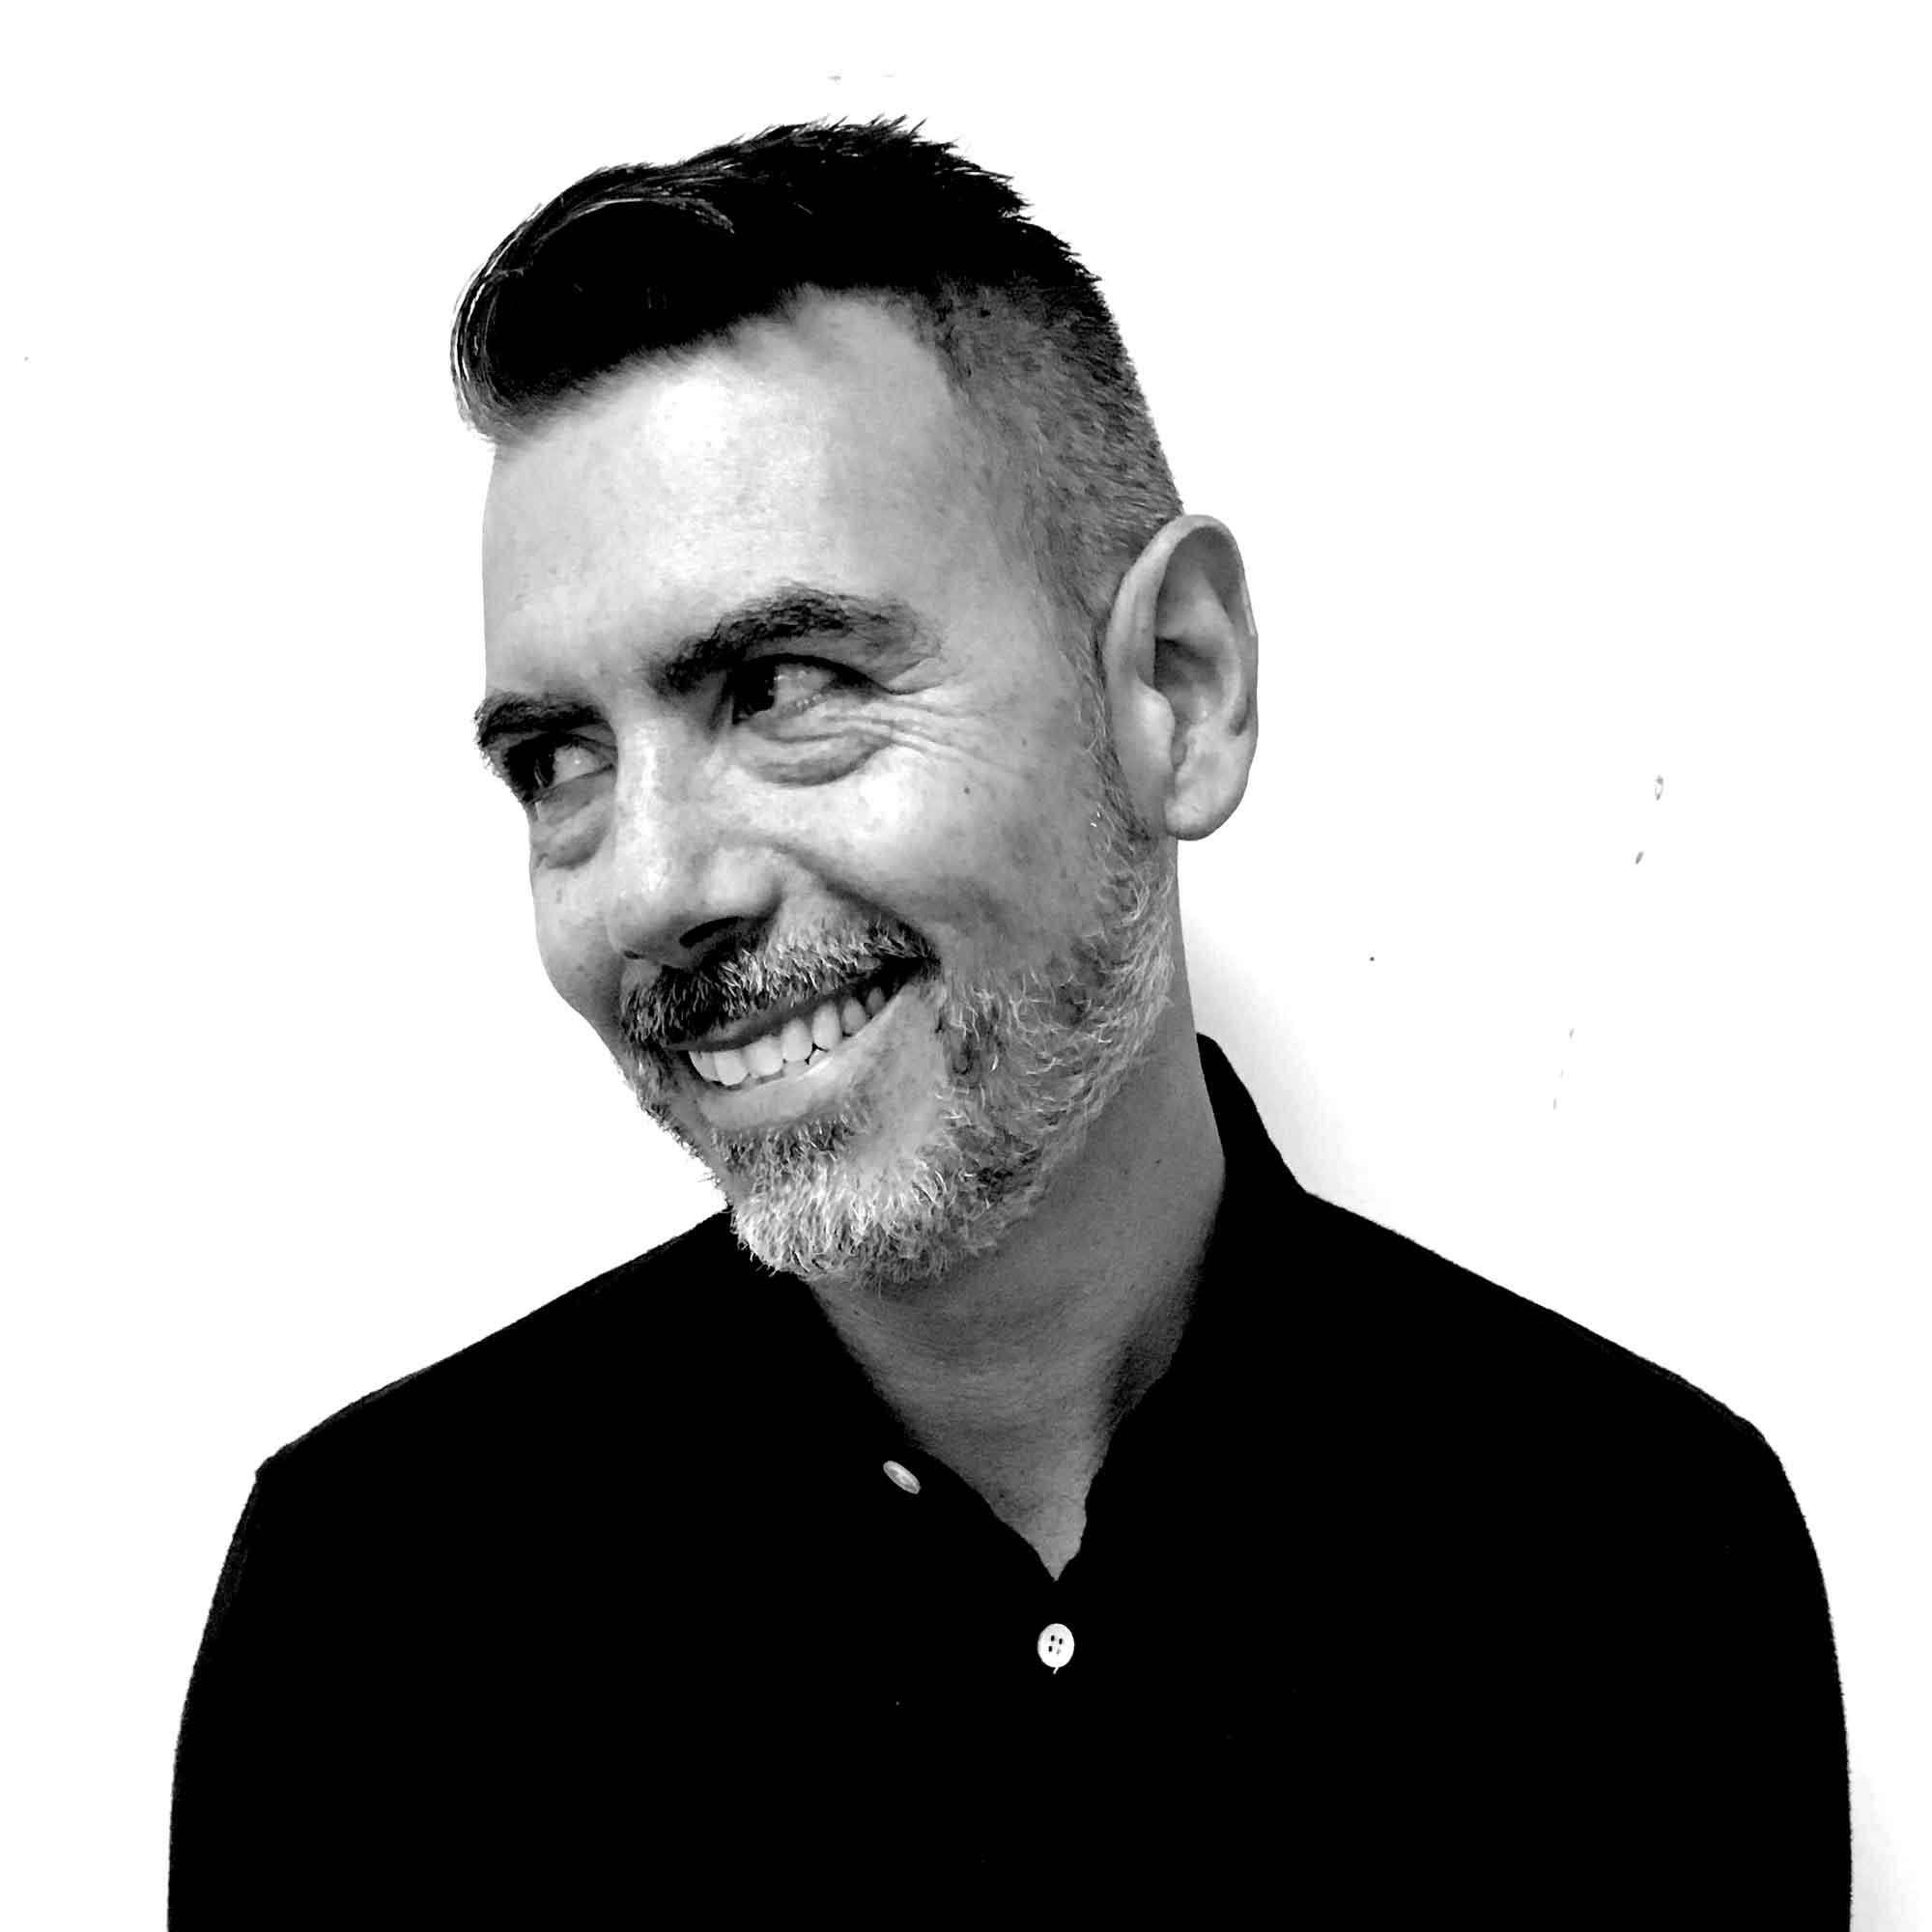 Image of Johnathan Massey